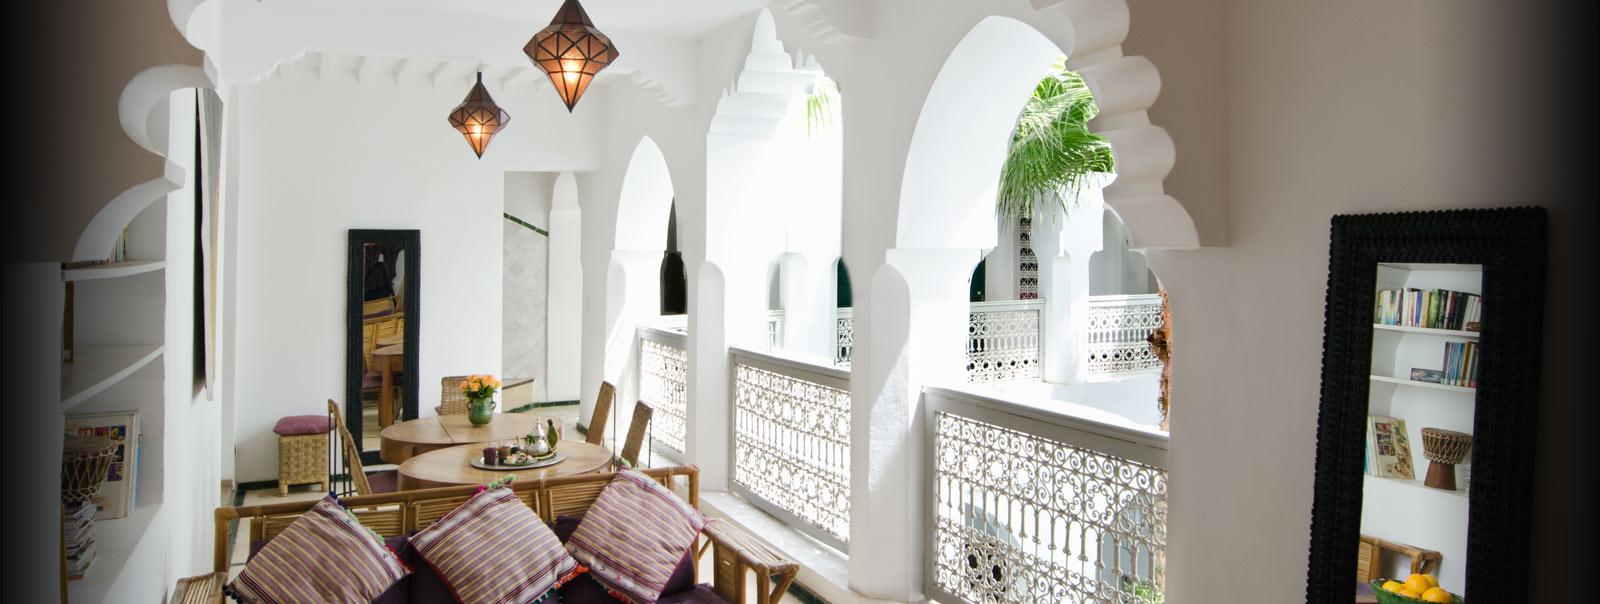 riad pas cher marrakech r server riad vert marrakech. Black Bedroom Furniture Sets. Home Design Ideas